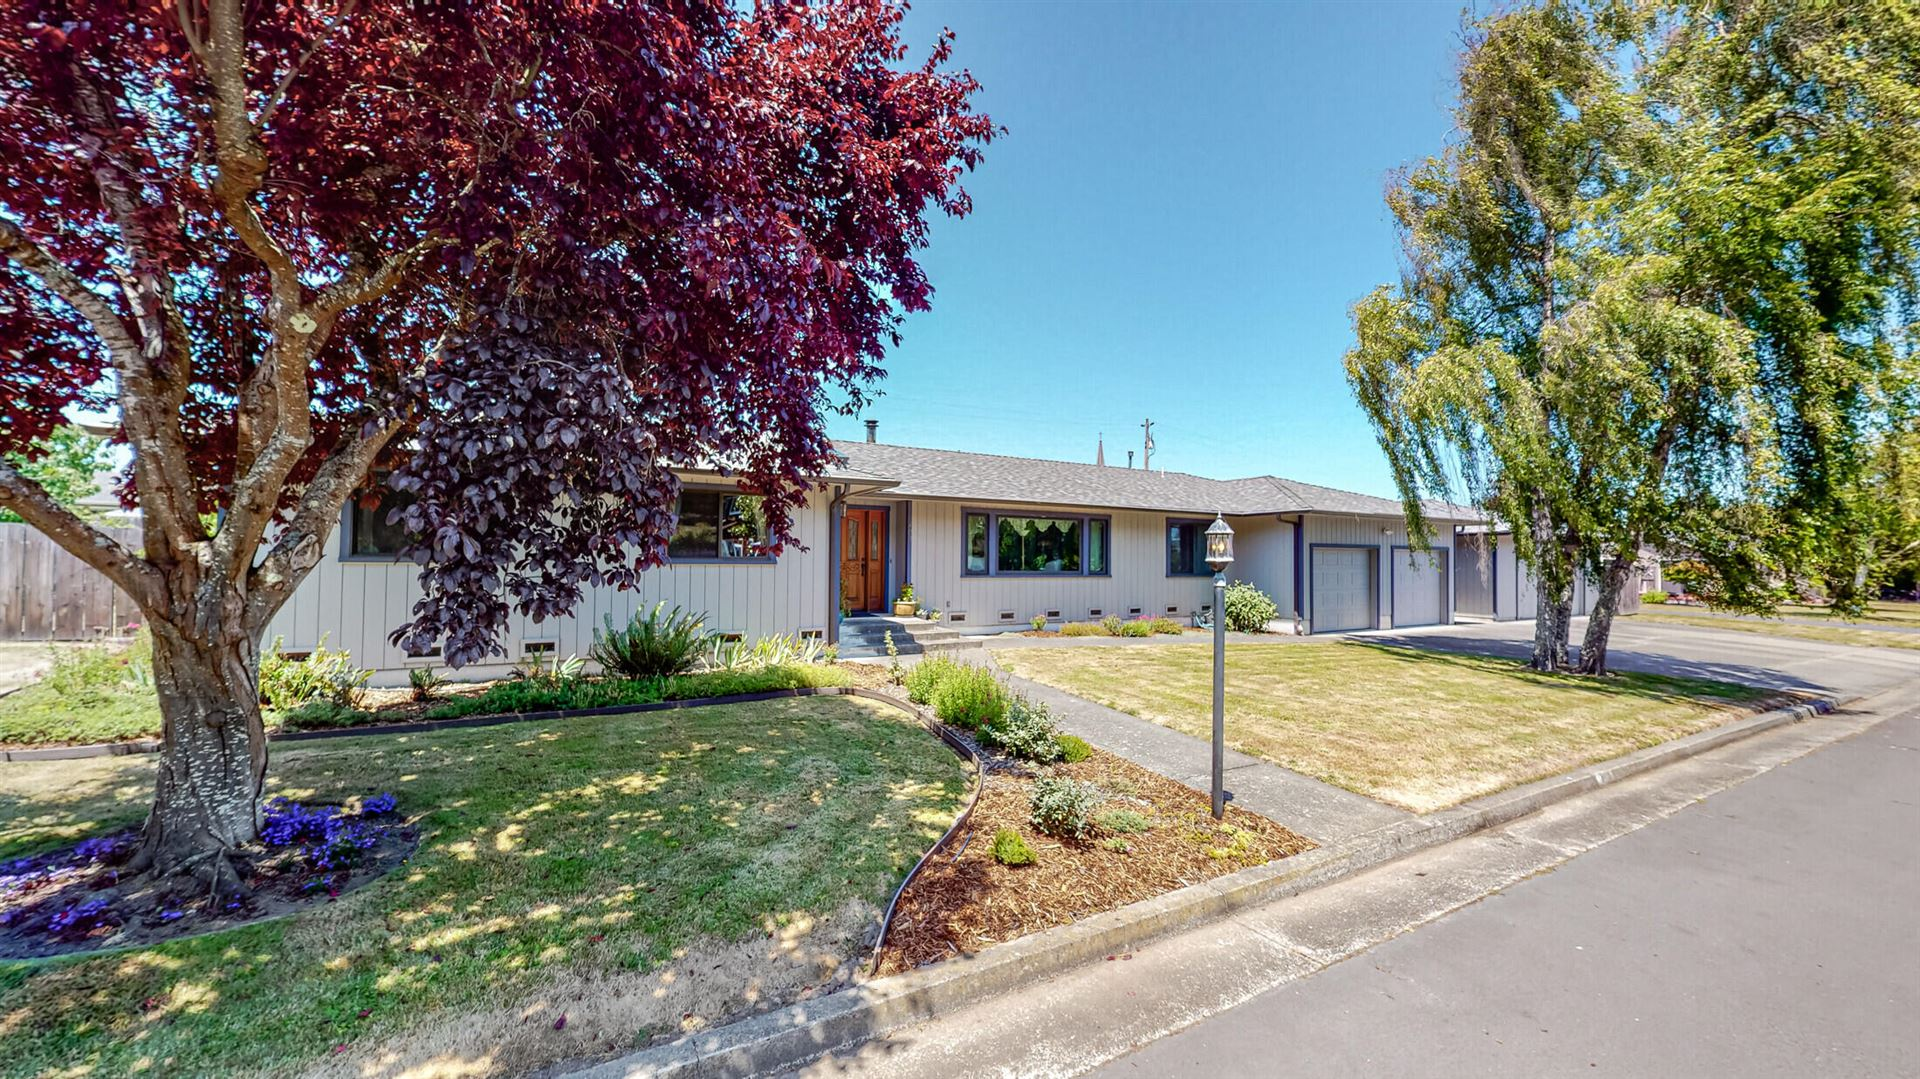 403 Emerson Lane, Ferndale, CA 95536 - MLS#: 259668